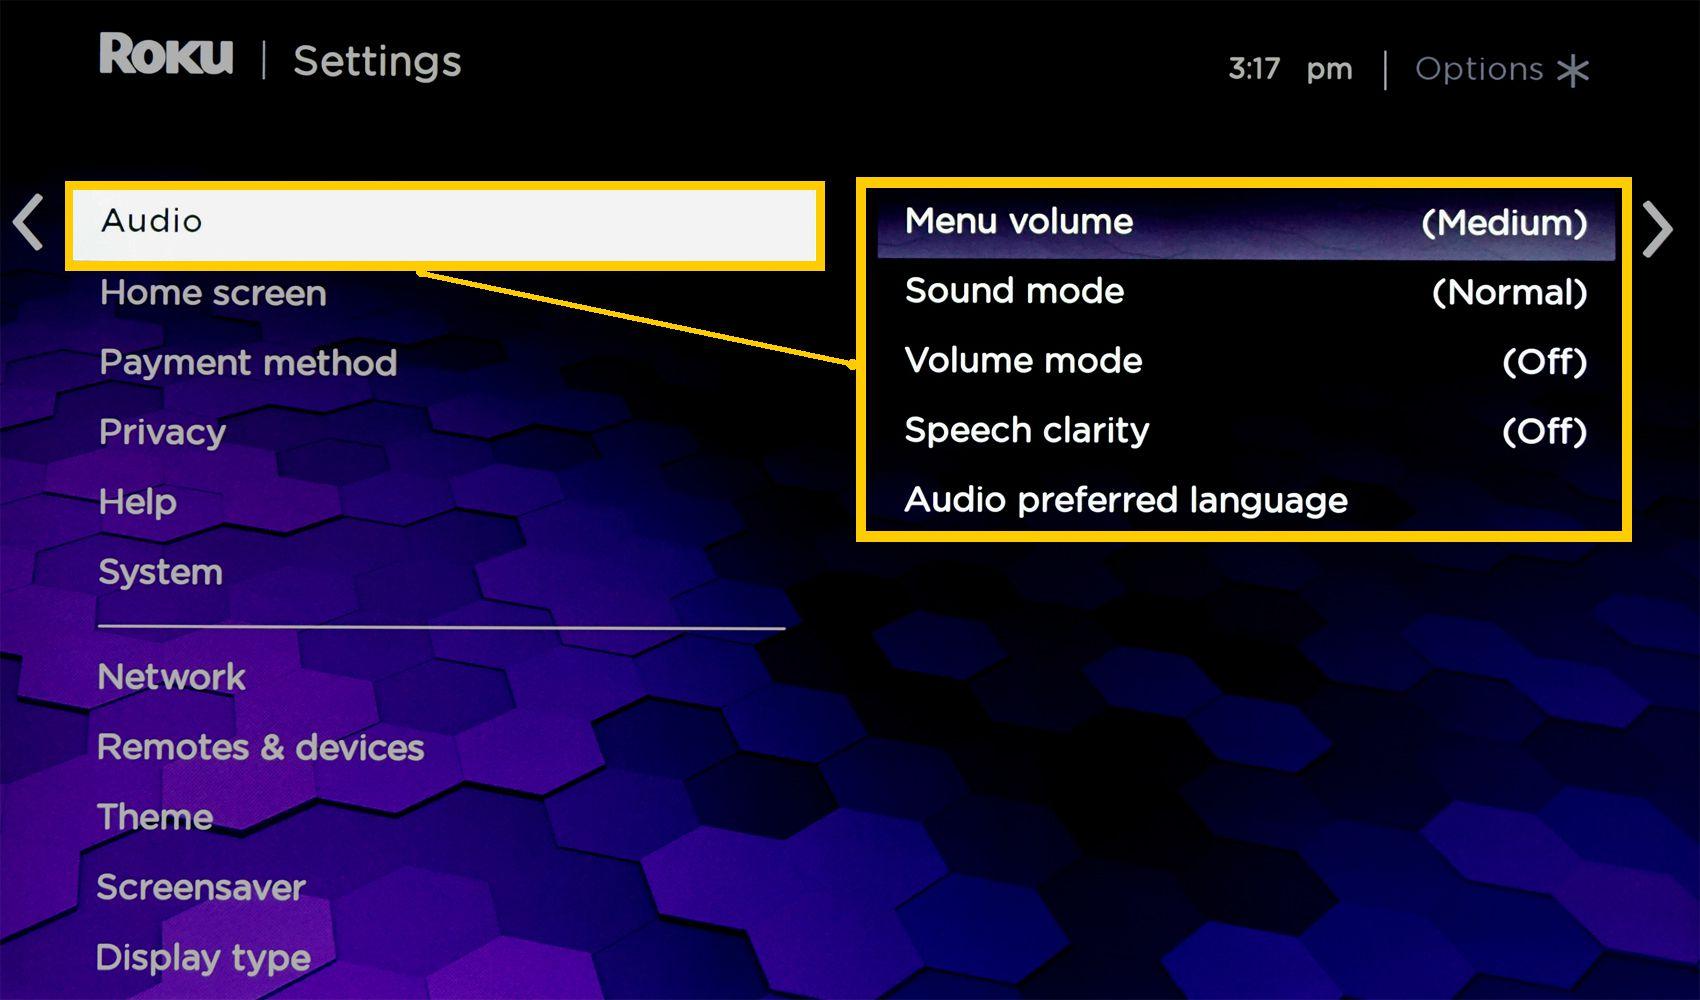 Roku Soundbar – Sound Settings